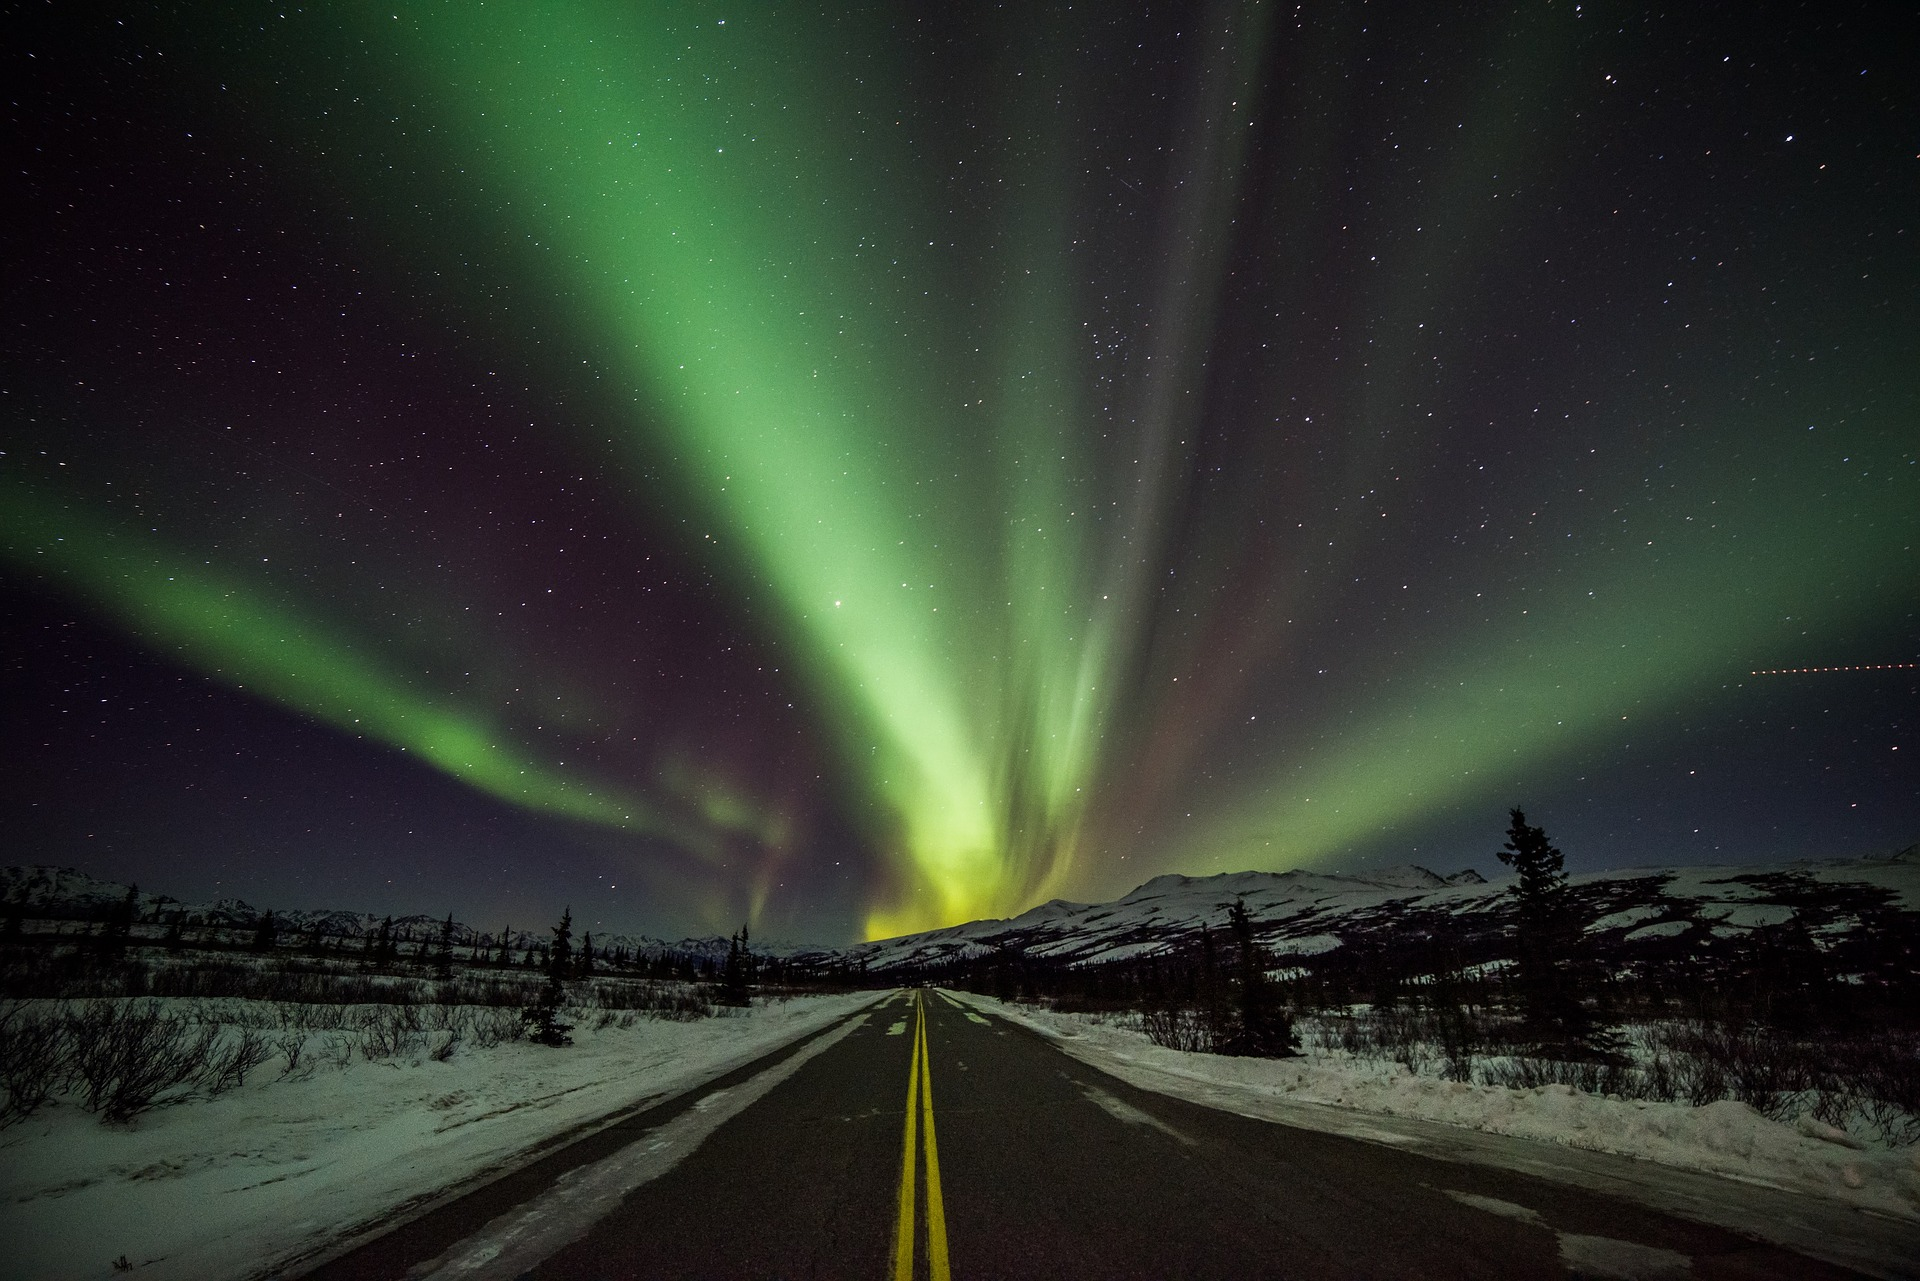 aurora-borealis-3715416_1920.jpg